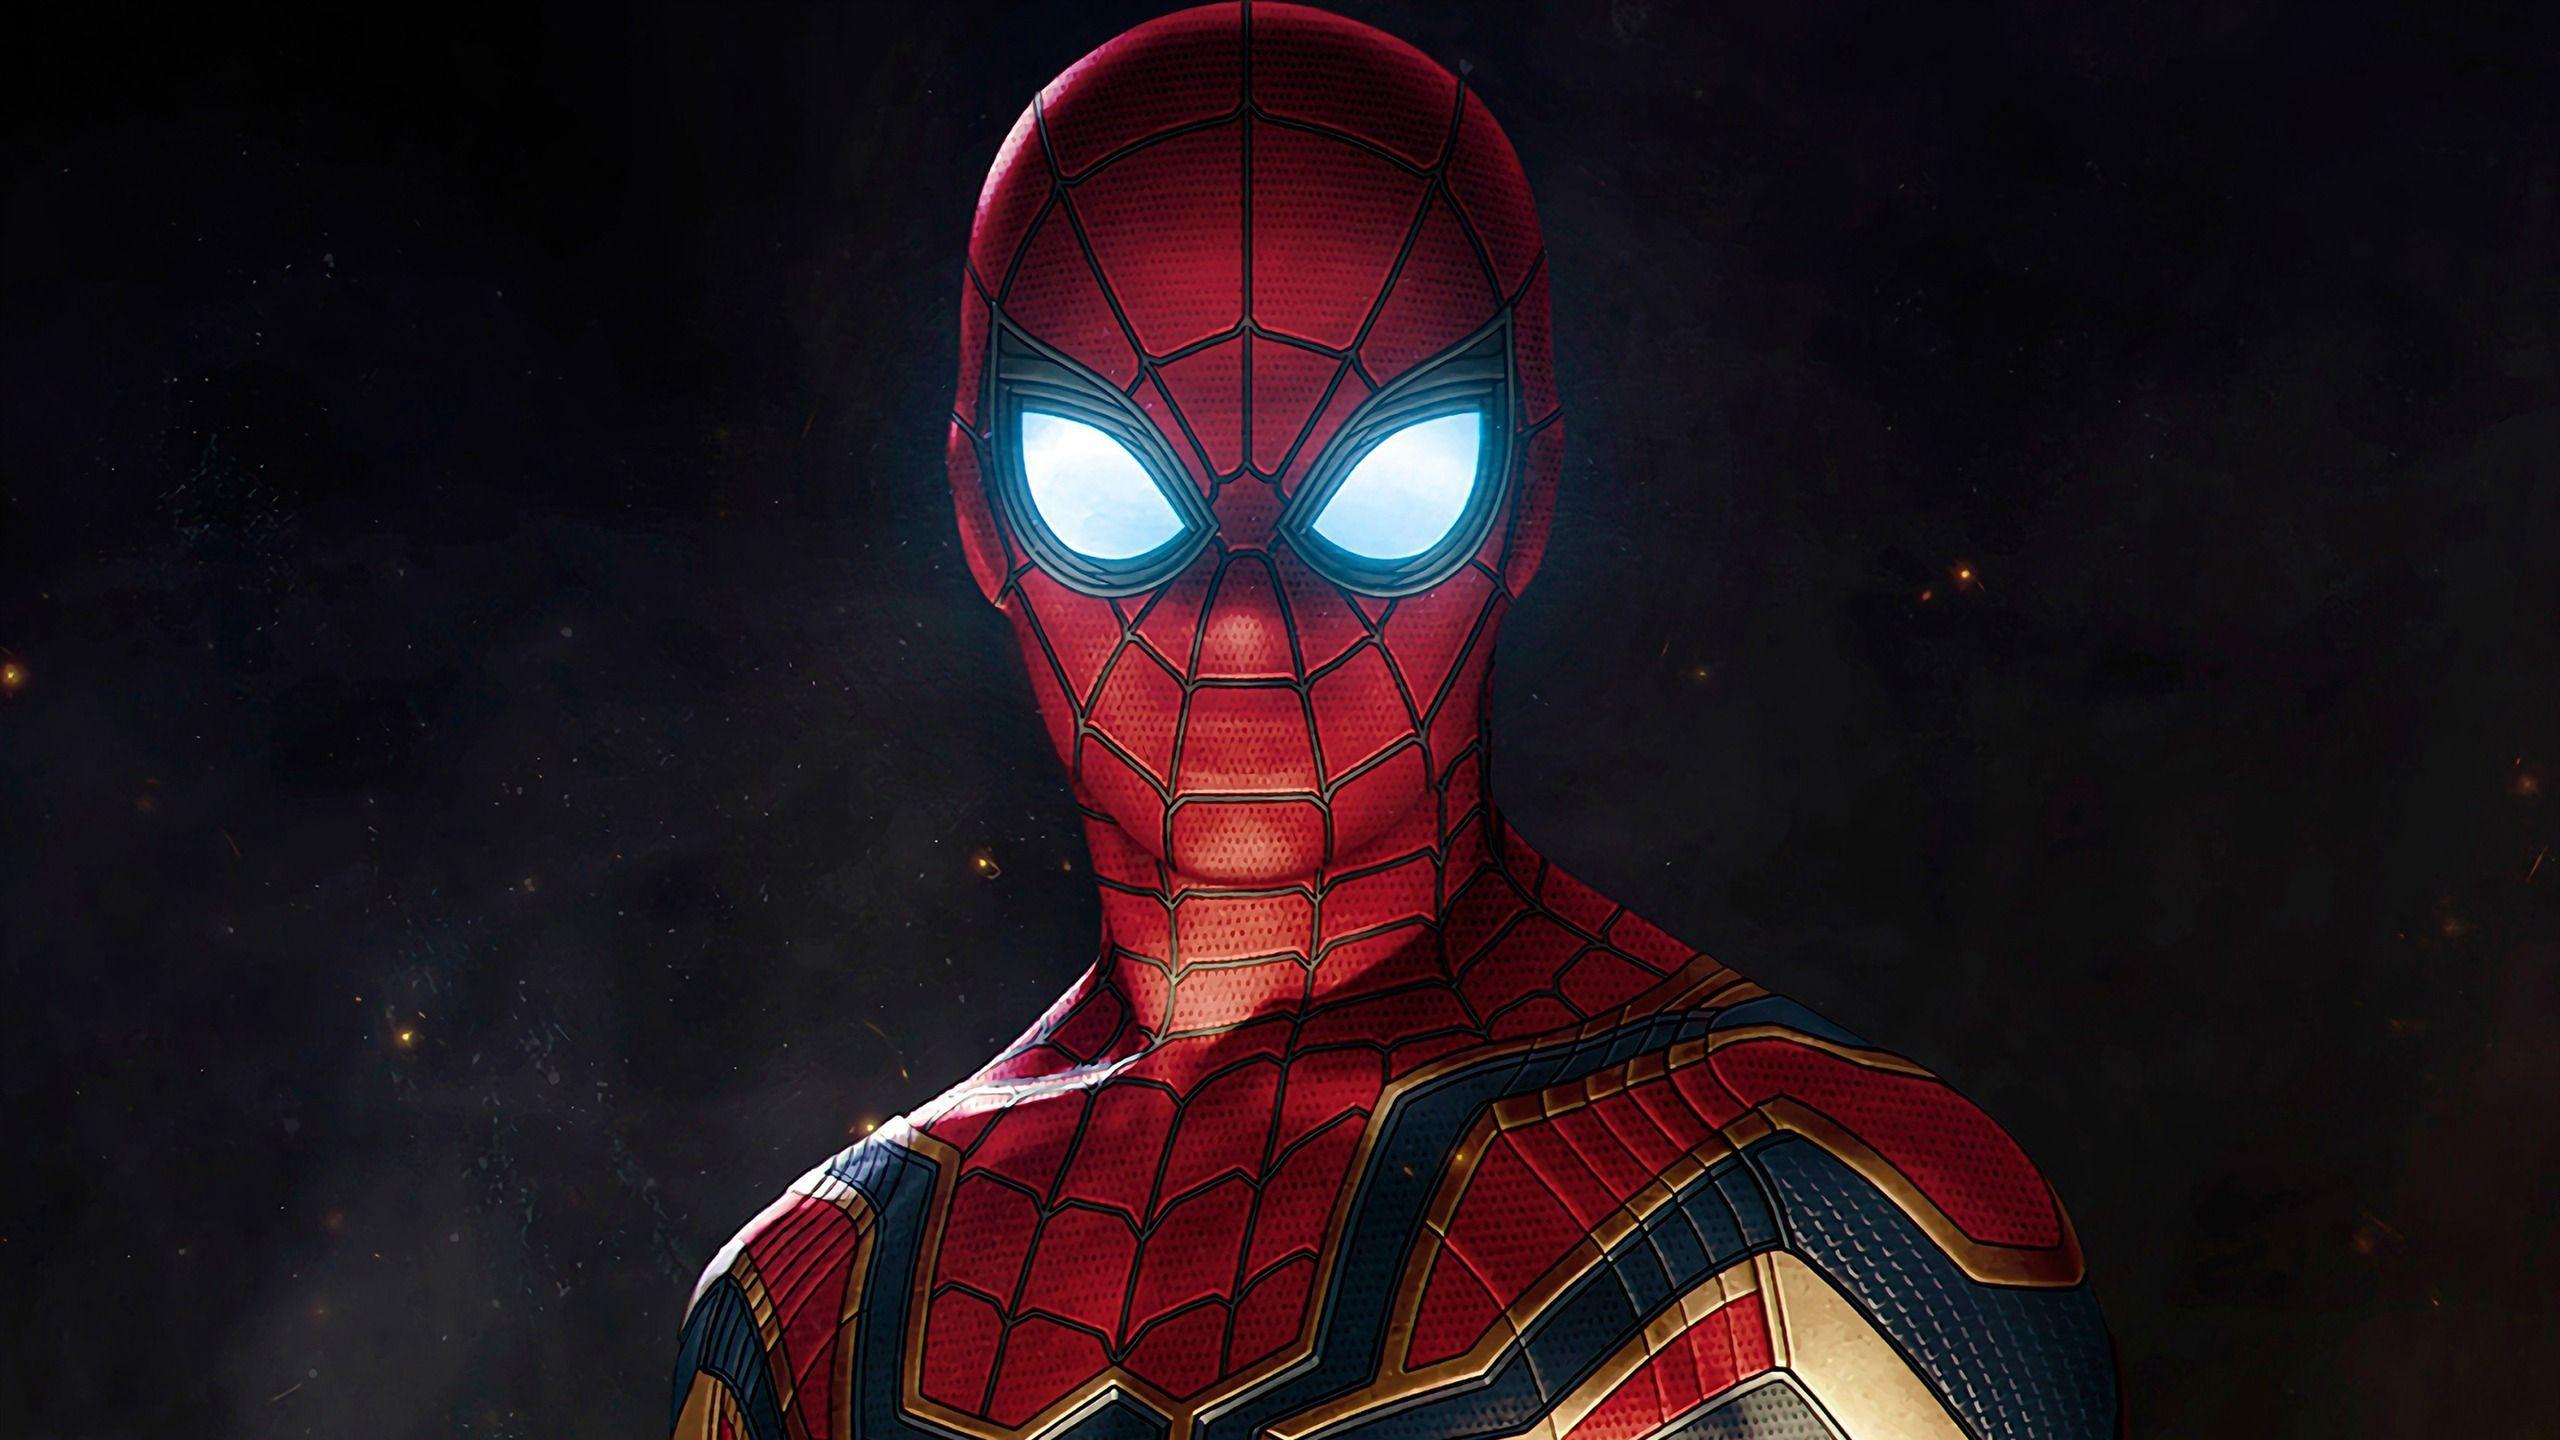 Spider man 2018 wallpapers wallpaper cave - Spider man infinity war wallpaper ...